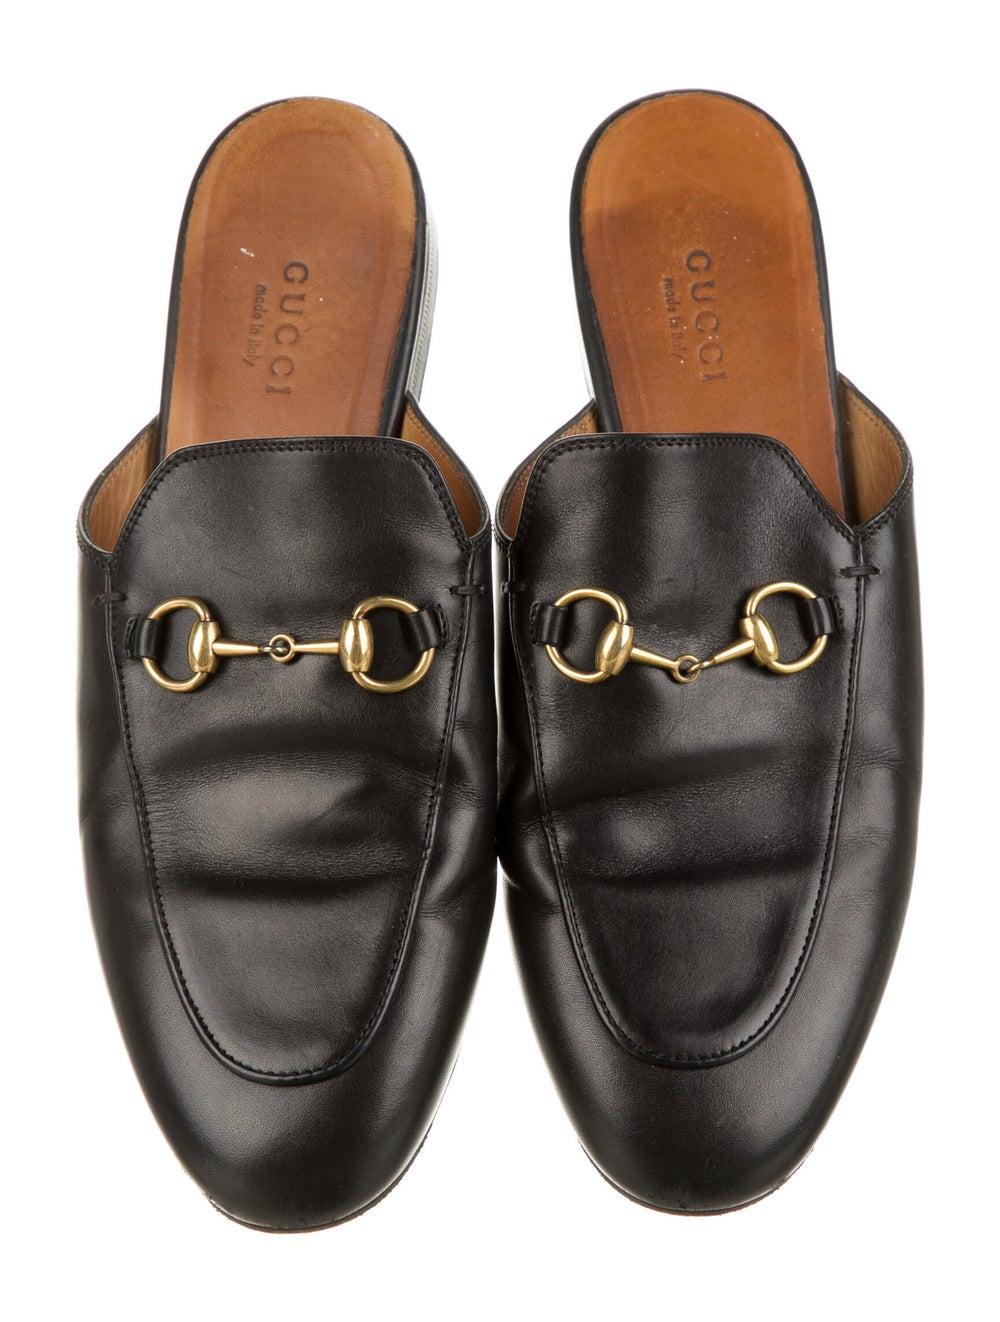 Gucci Horsebit Accent Leather Mules Black - image 3